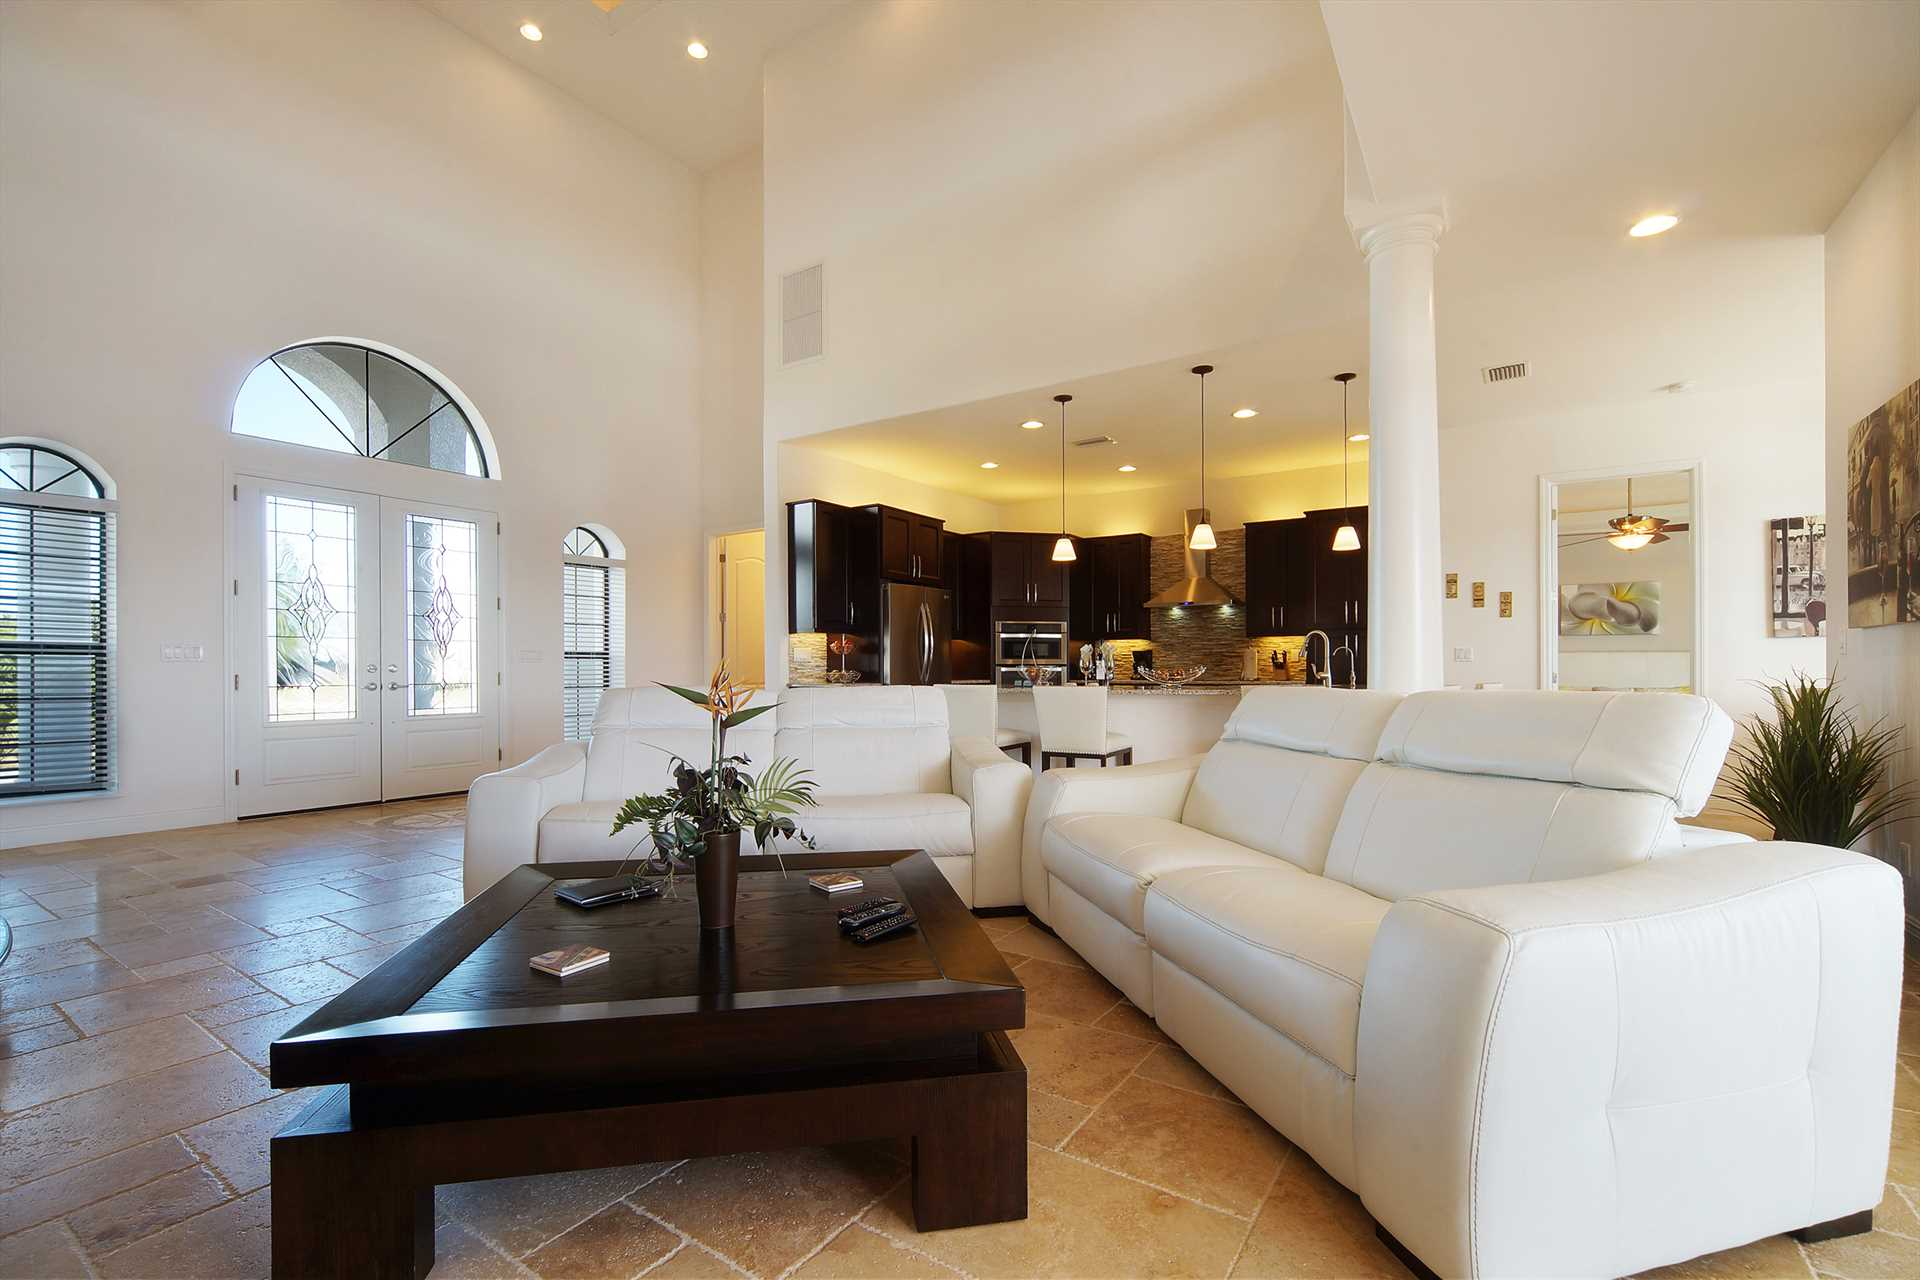 villa casablanca - elegant modern 2 story mansion with huge pool, Schlafzimmer entwurf